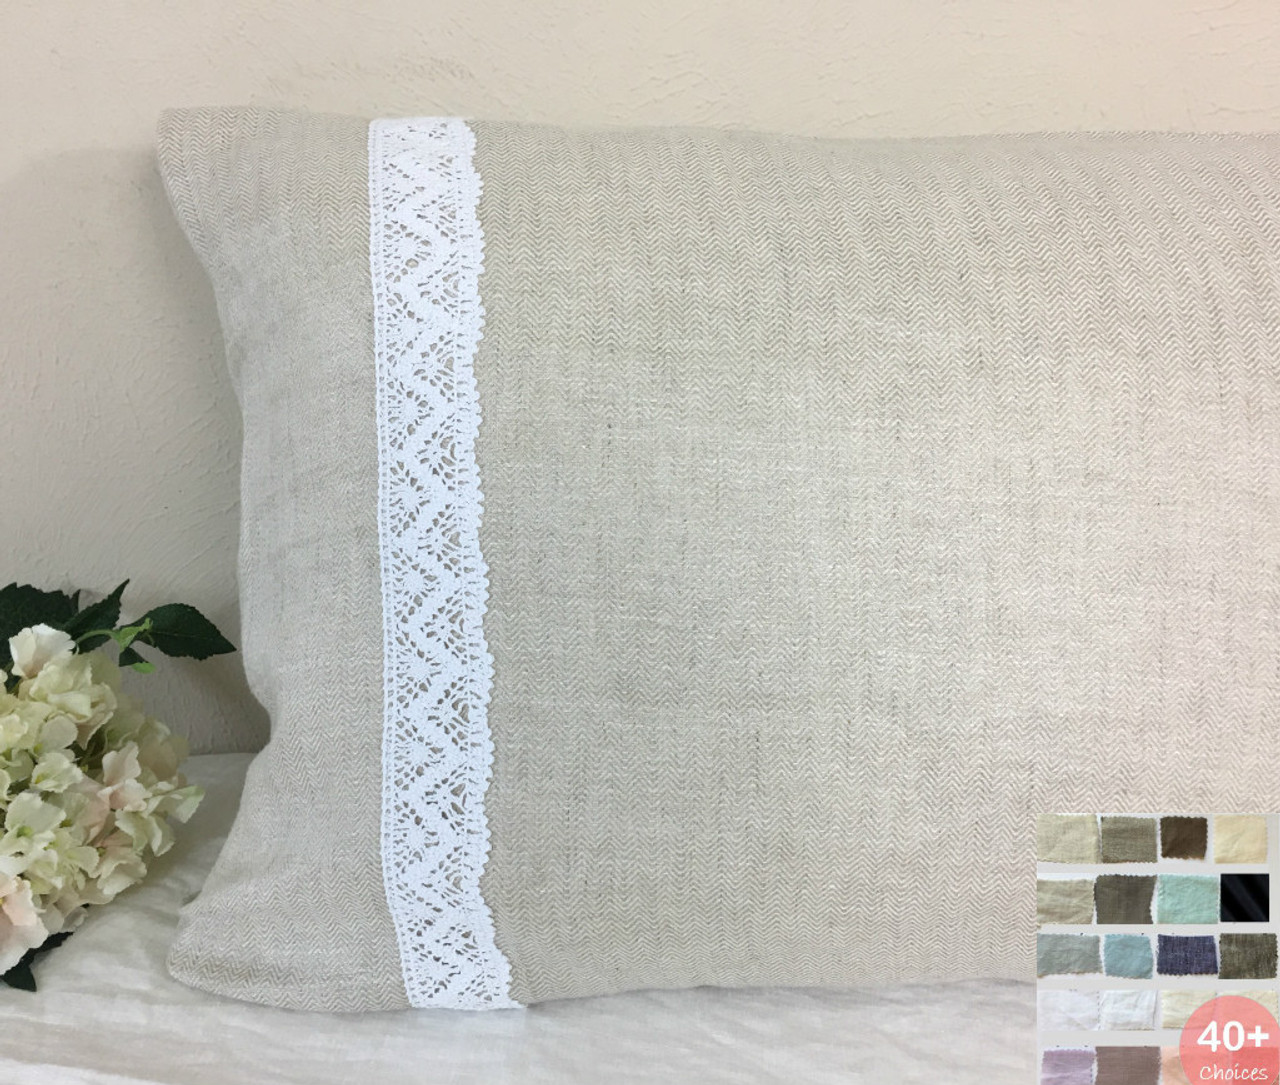 Linen Pillow Sham Cover With Crochet Lace White Grey Cream Pink Blue Stripe Chevron 40 Colors Custom Size 16x16 18x18 20x20 24x24 26x26 30x30 28x28